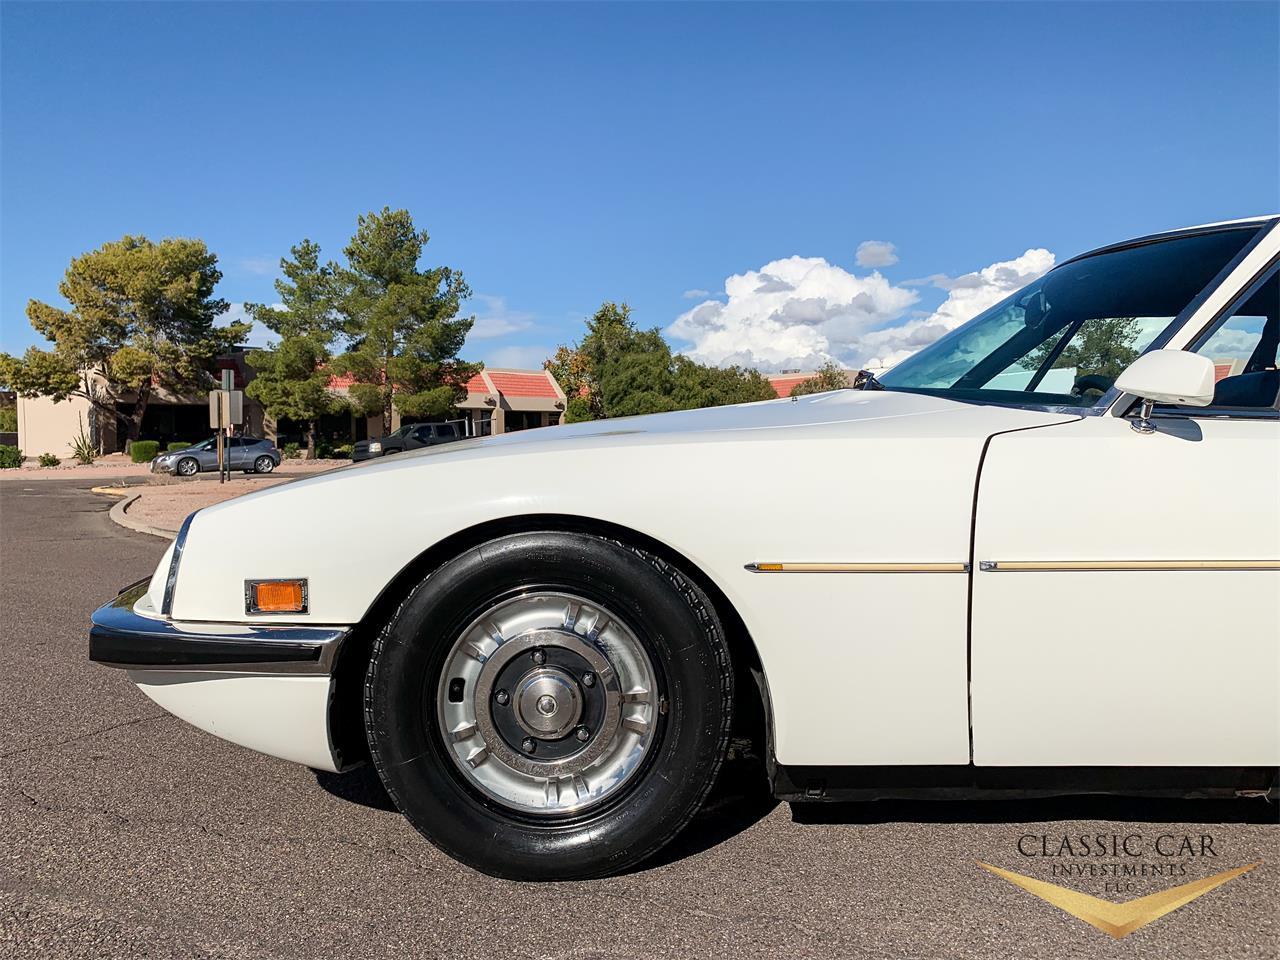 Large Picture of 1972 Citroen SM located in Arizona - $53,500.00 - P667